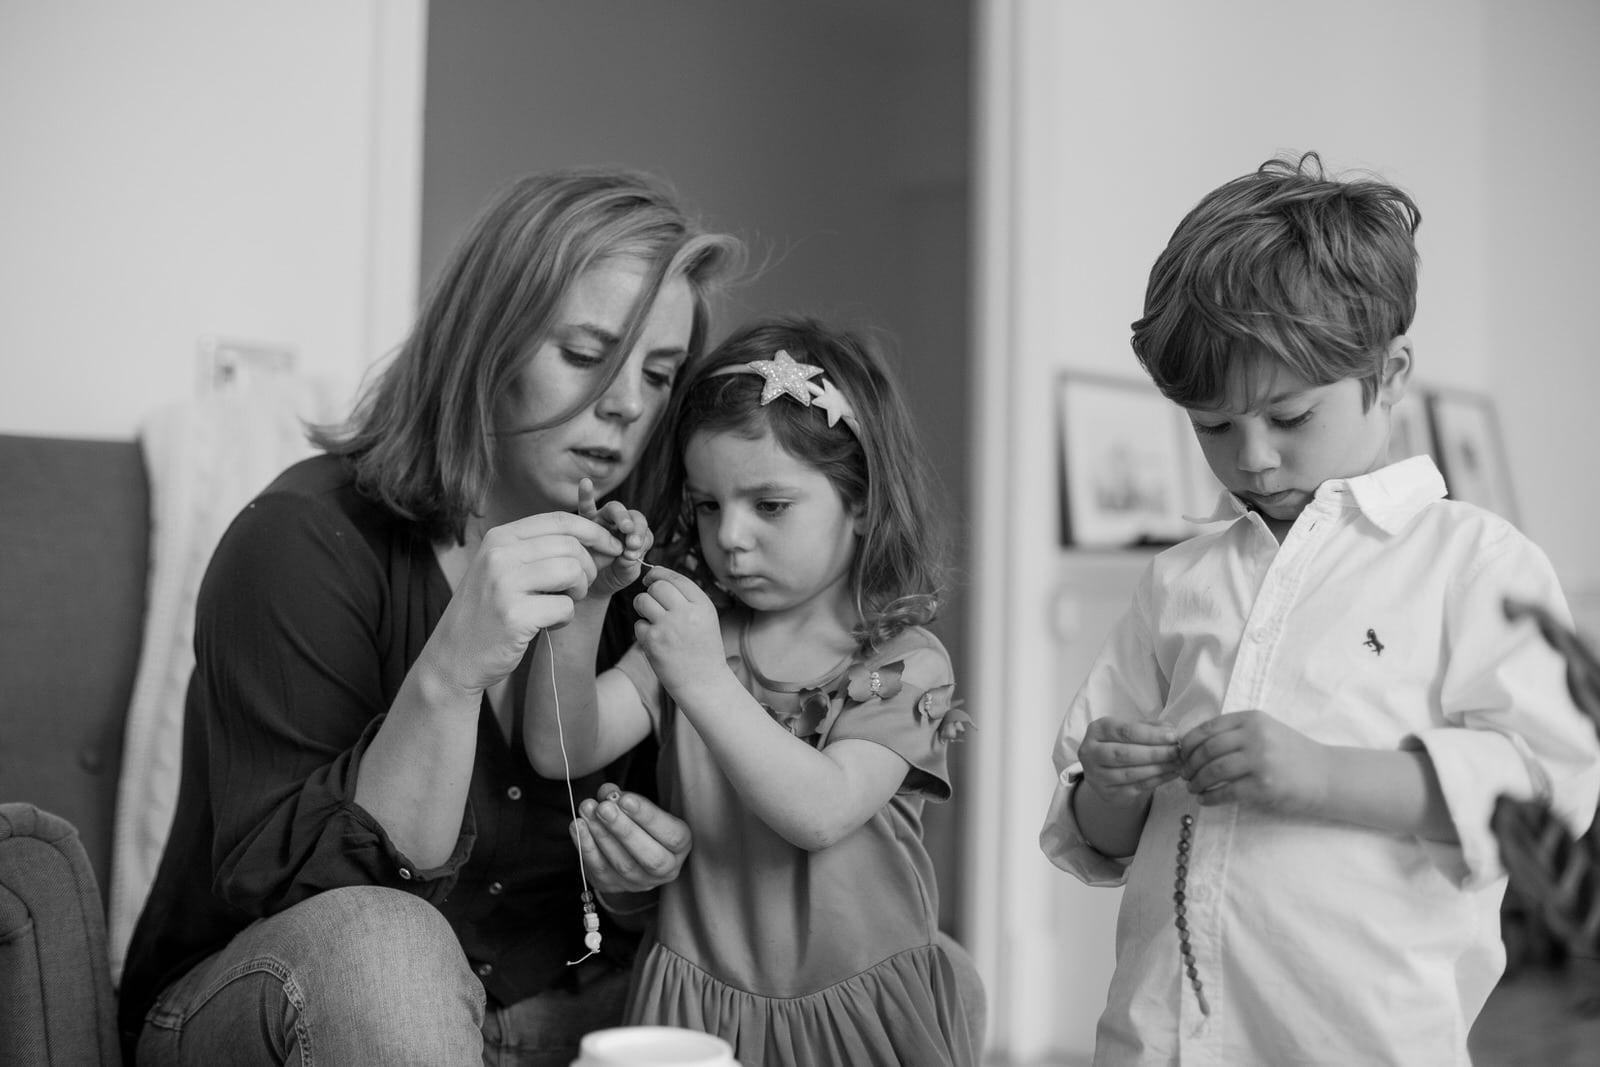 kensington-day-in-the-life-documentary-family-photographs-0129